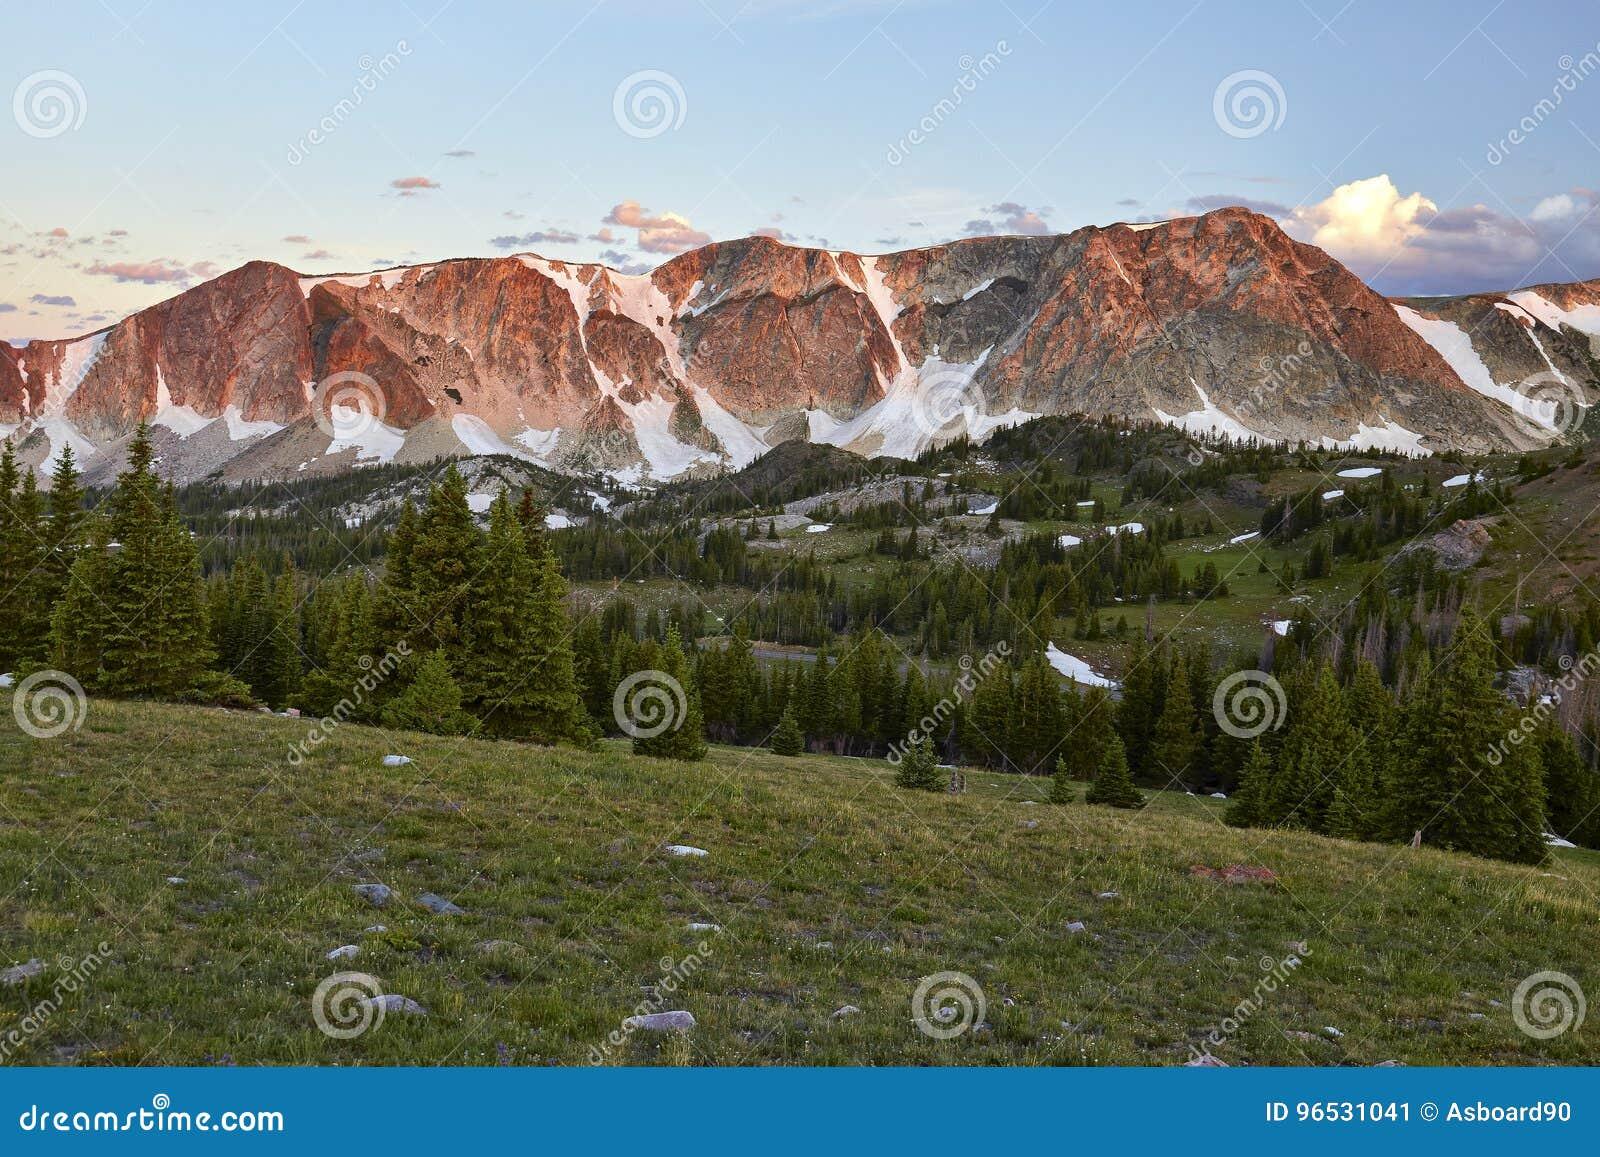 Snowy Range, Wyoming